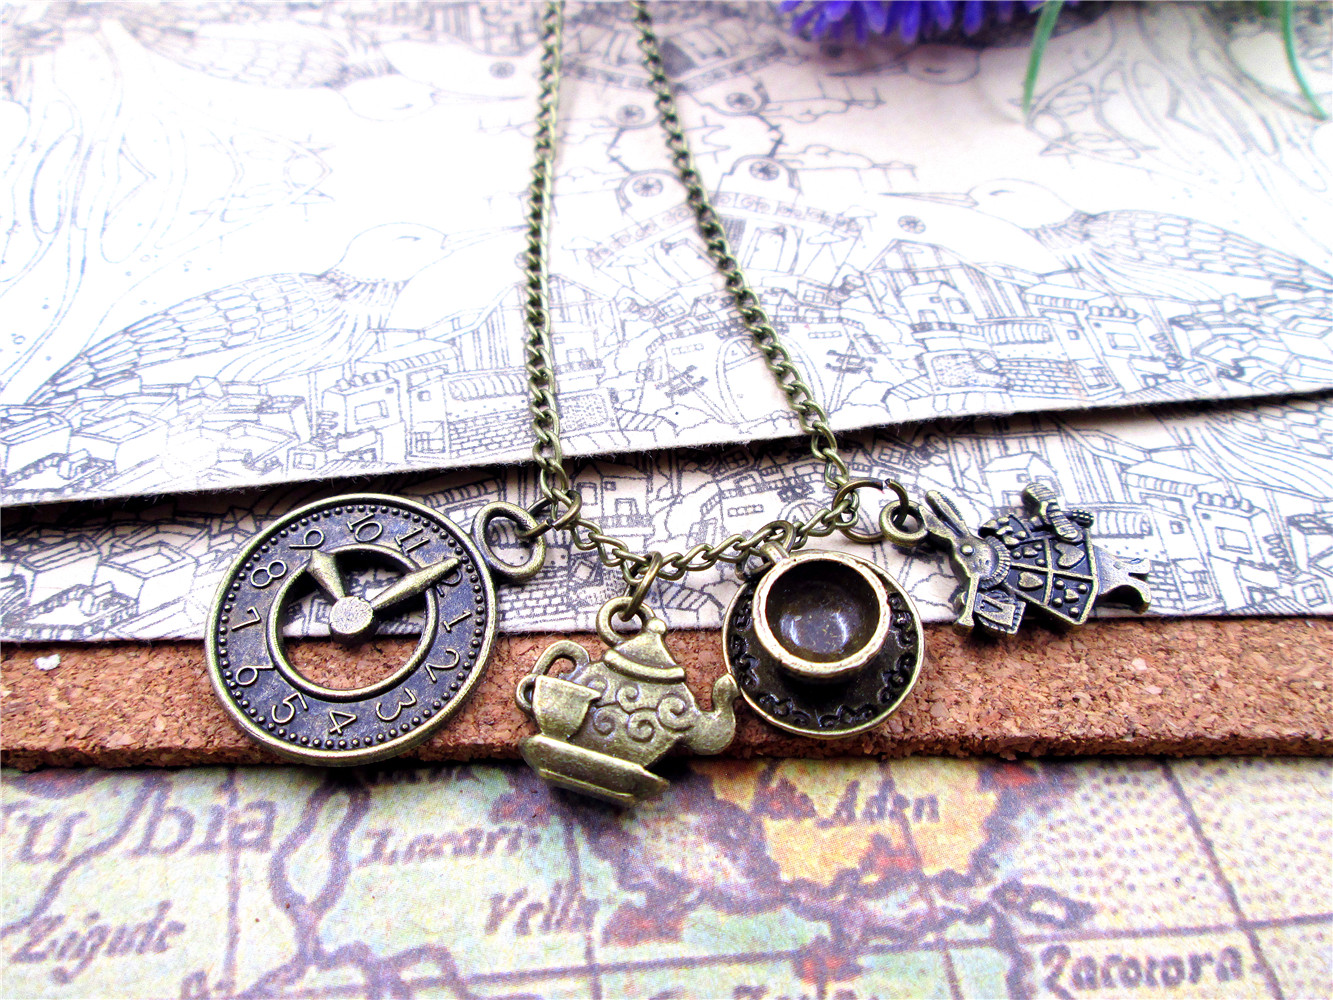 fashion   Antique bronze  Alice in Wonderland  necklace  Teapot with teacup Clock rabbit  charm pendant necklace